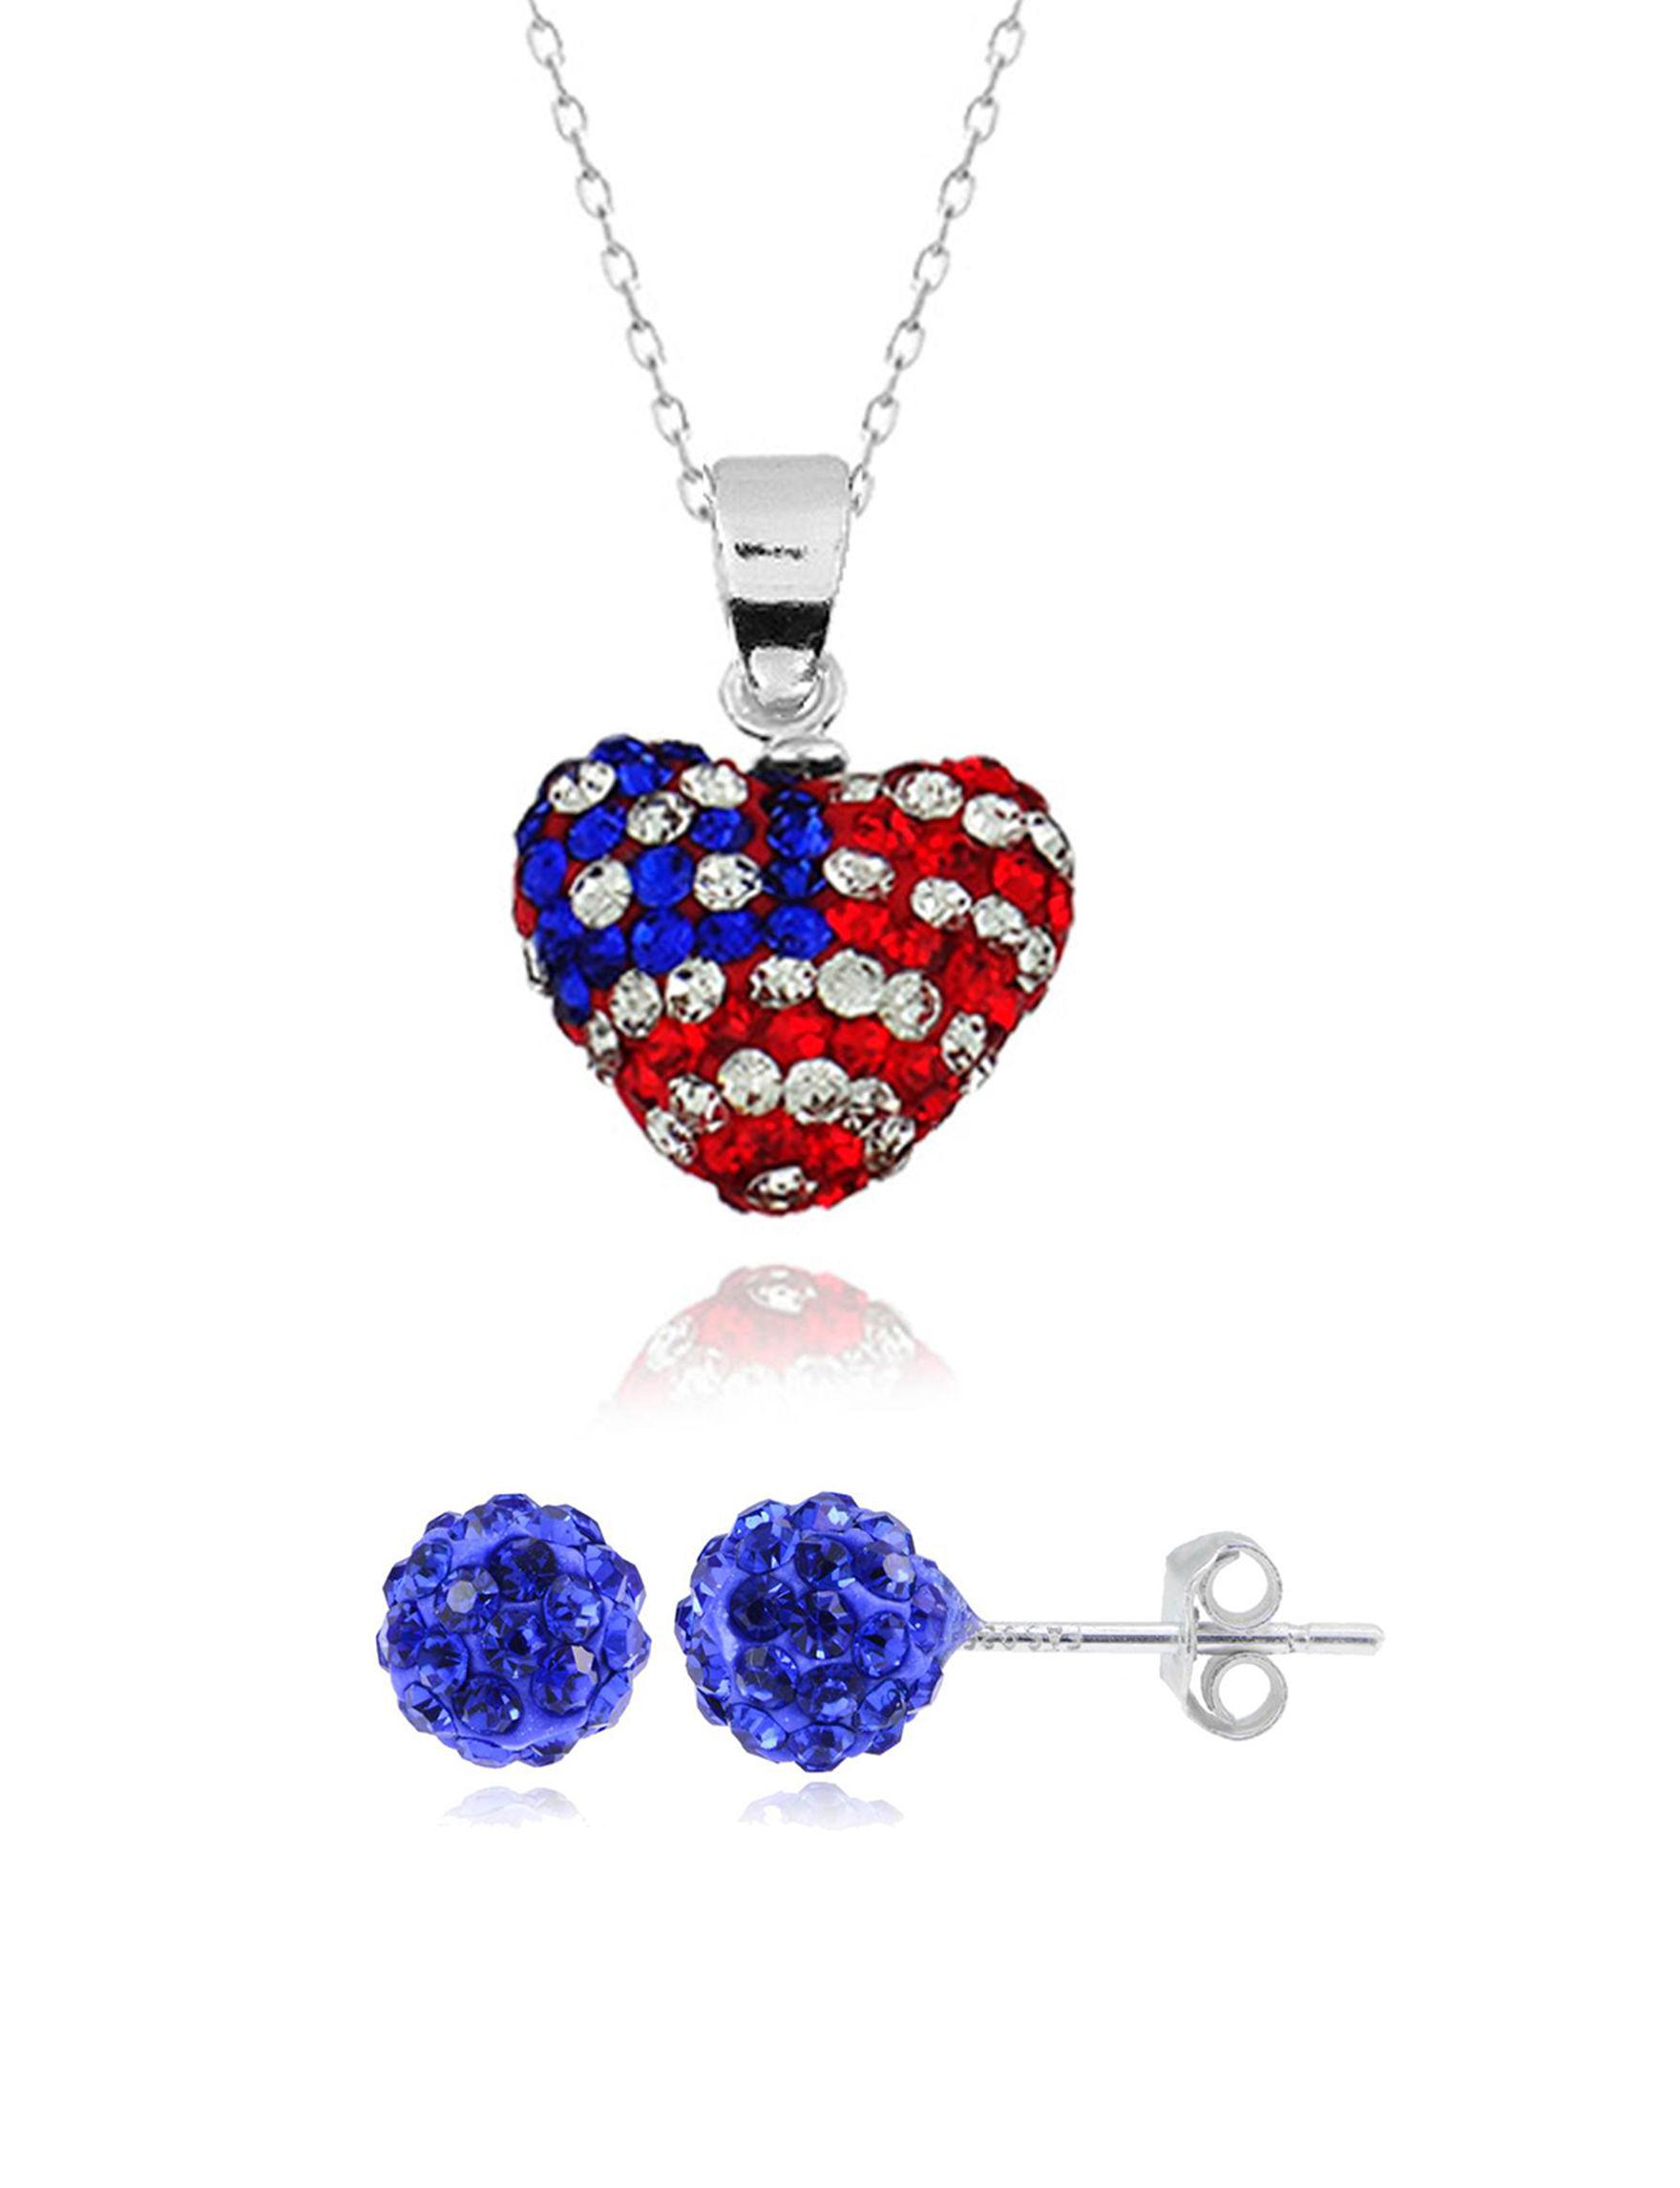 FMC Silver Necklaces & Pendants Fine Jewelry